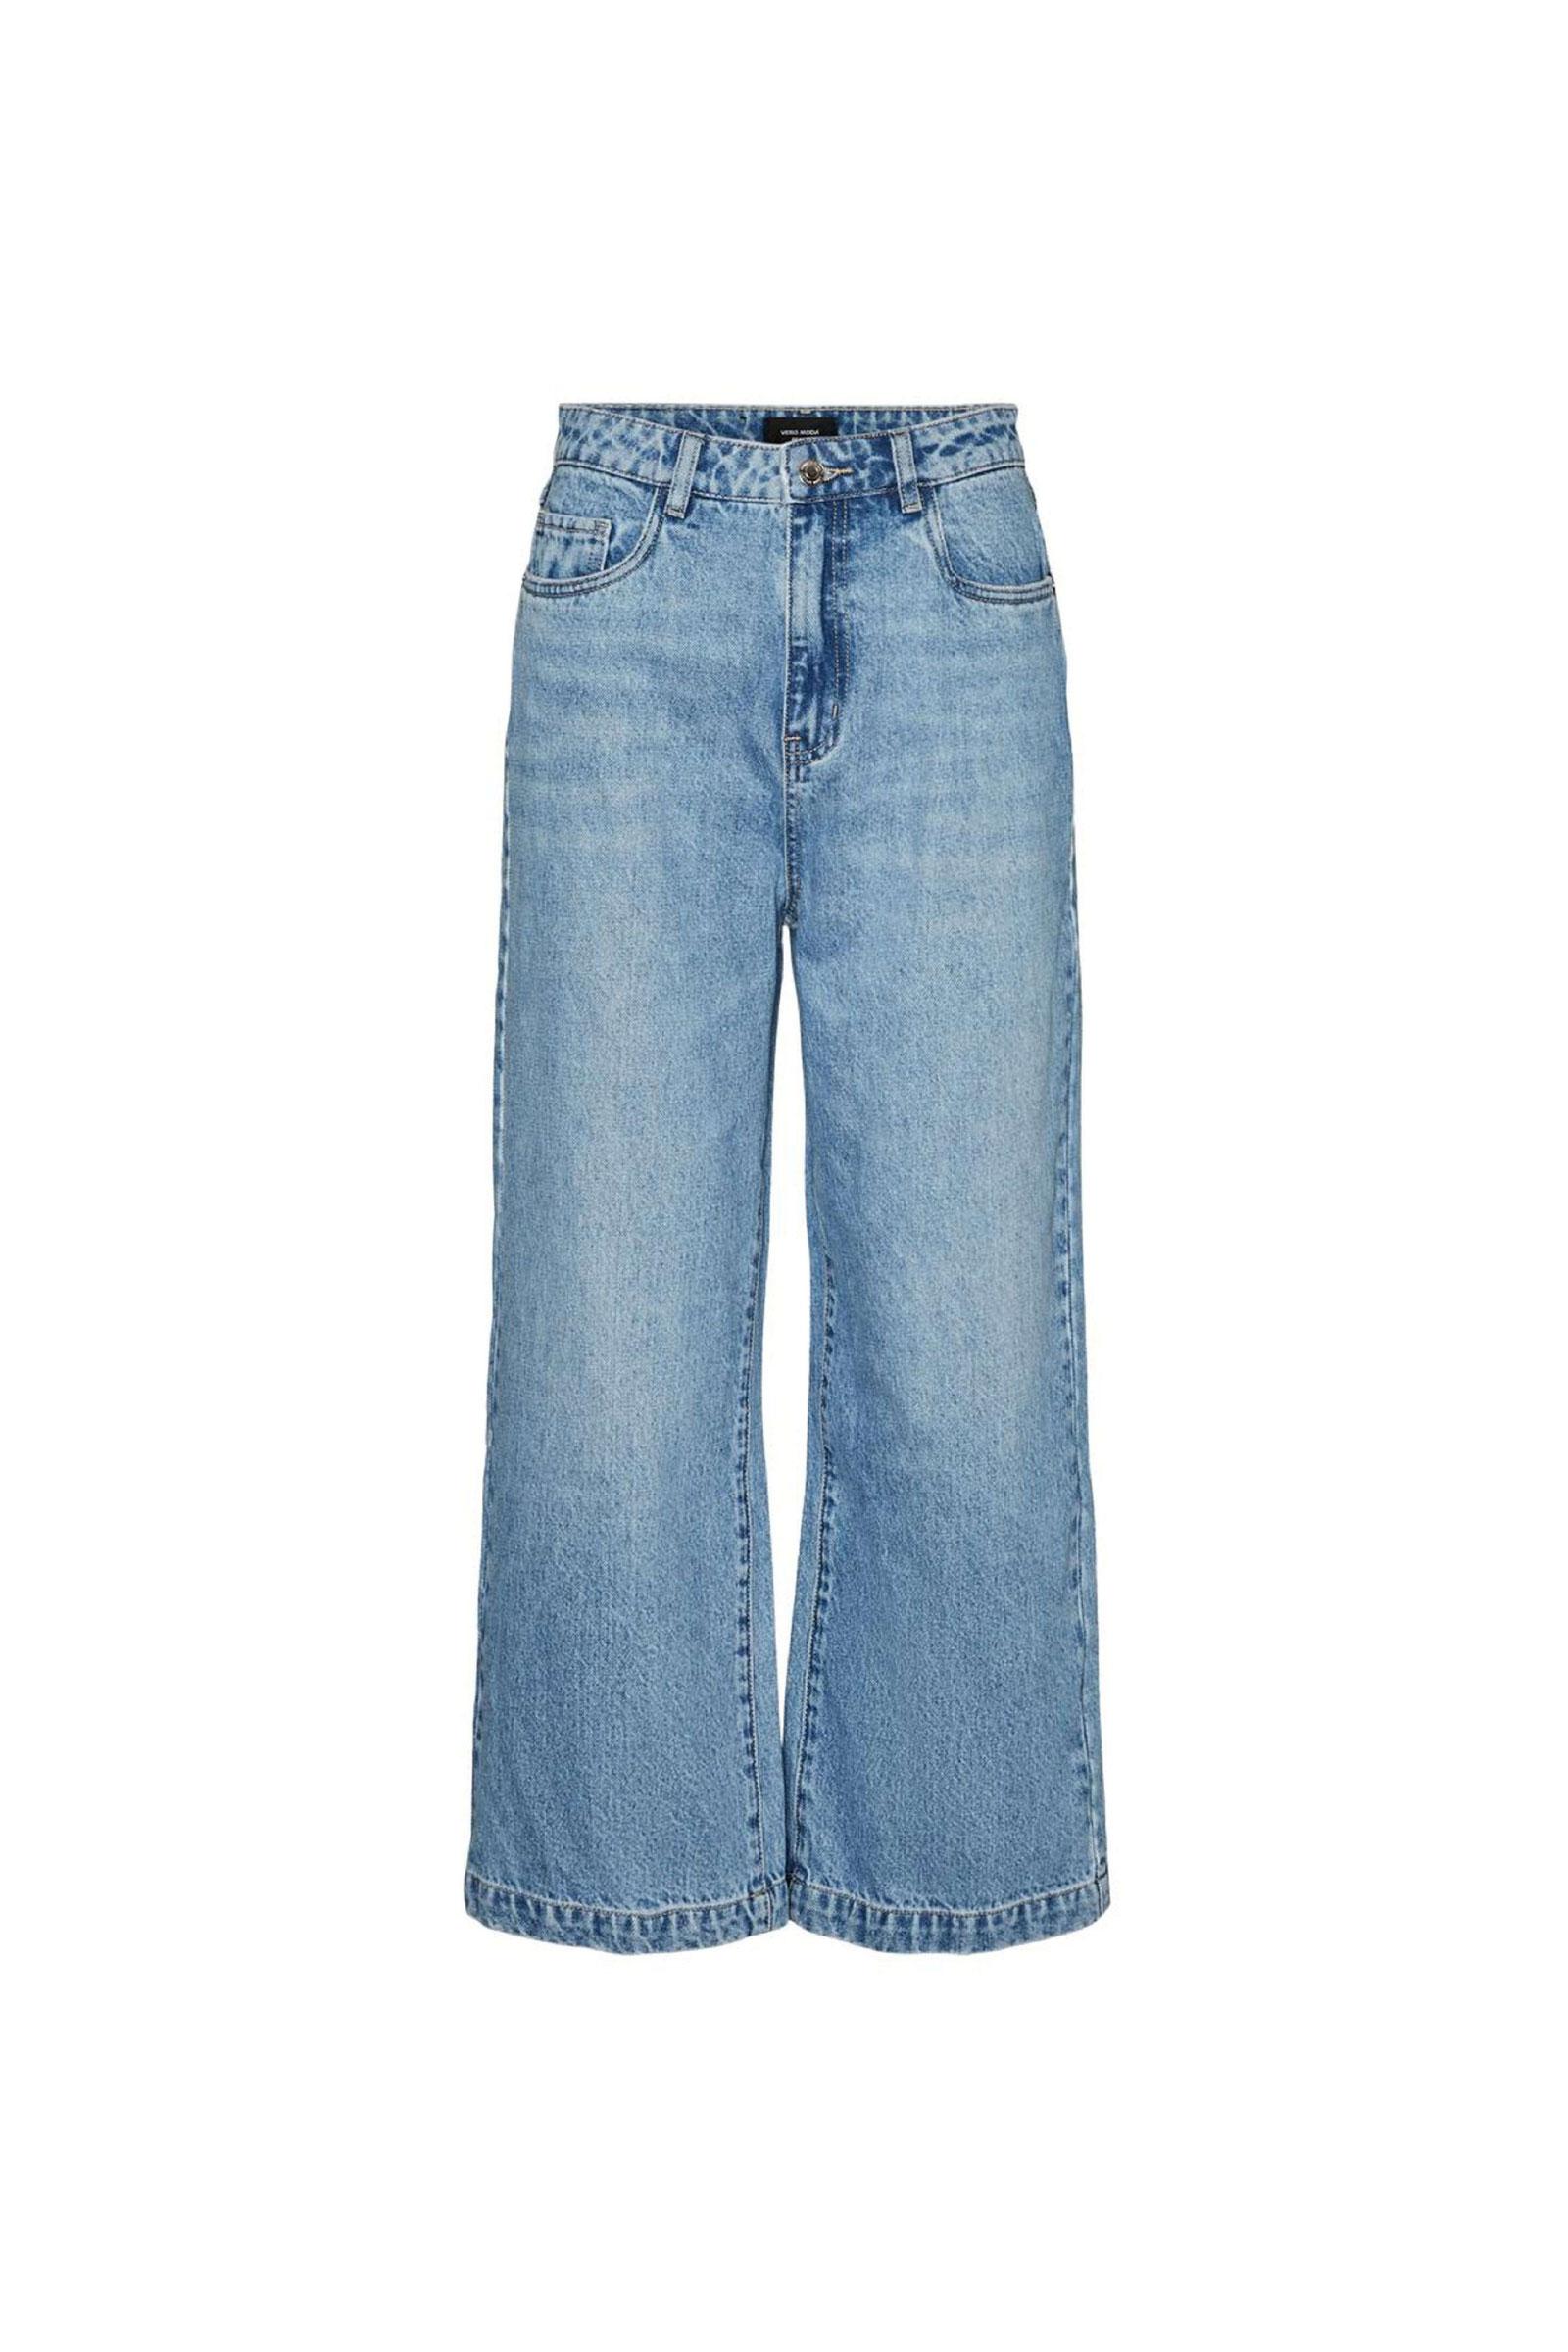 VERO MODA Jeans Donna Modello KATHY VERO MODA | Jeans | 10245416Light Blue Denim